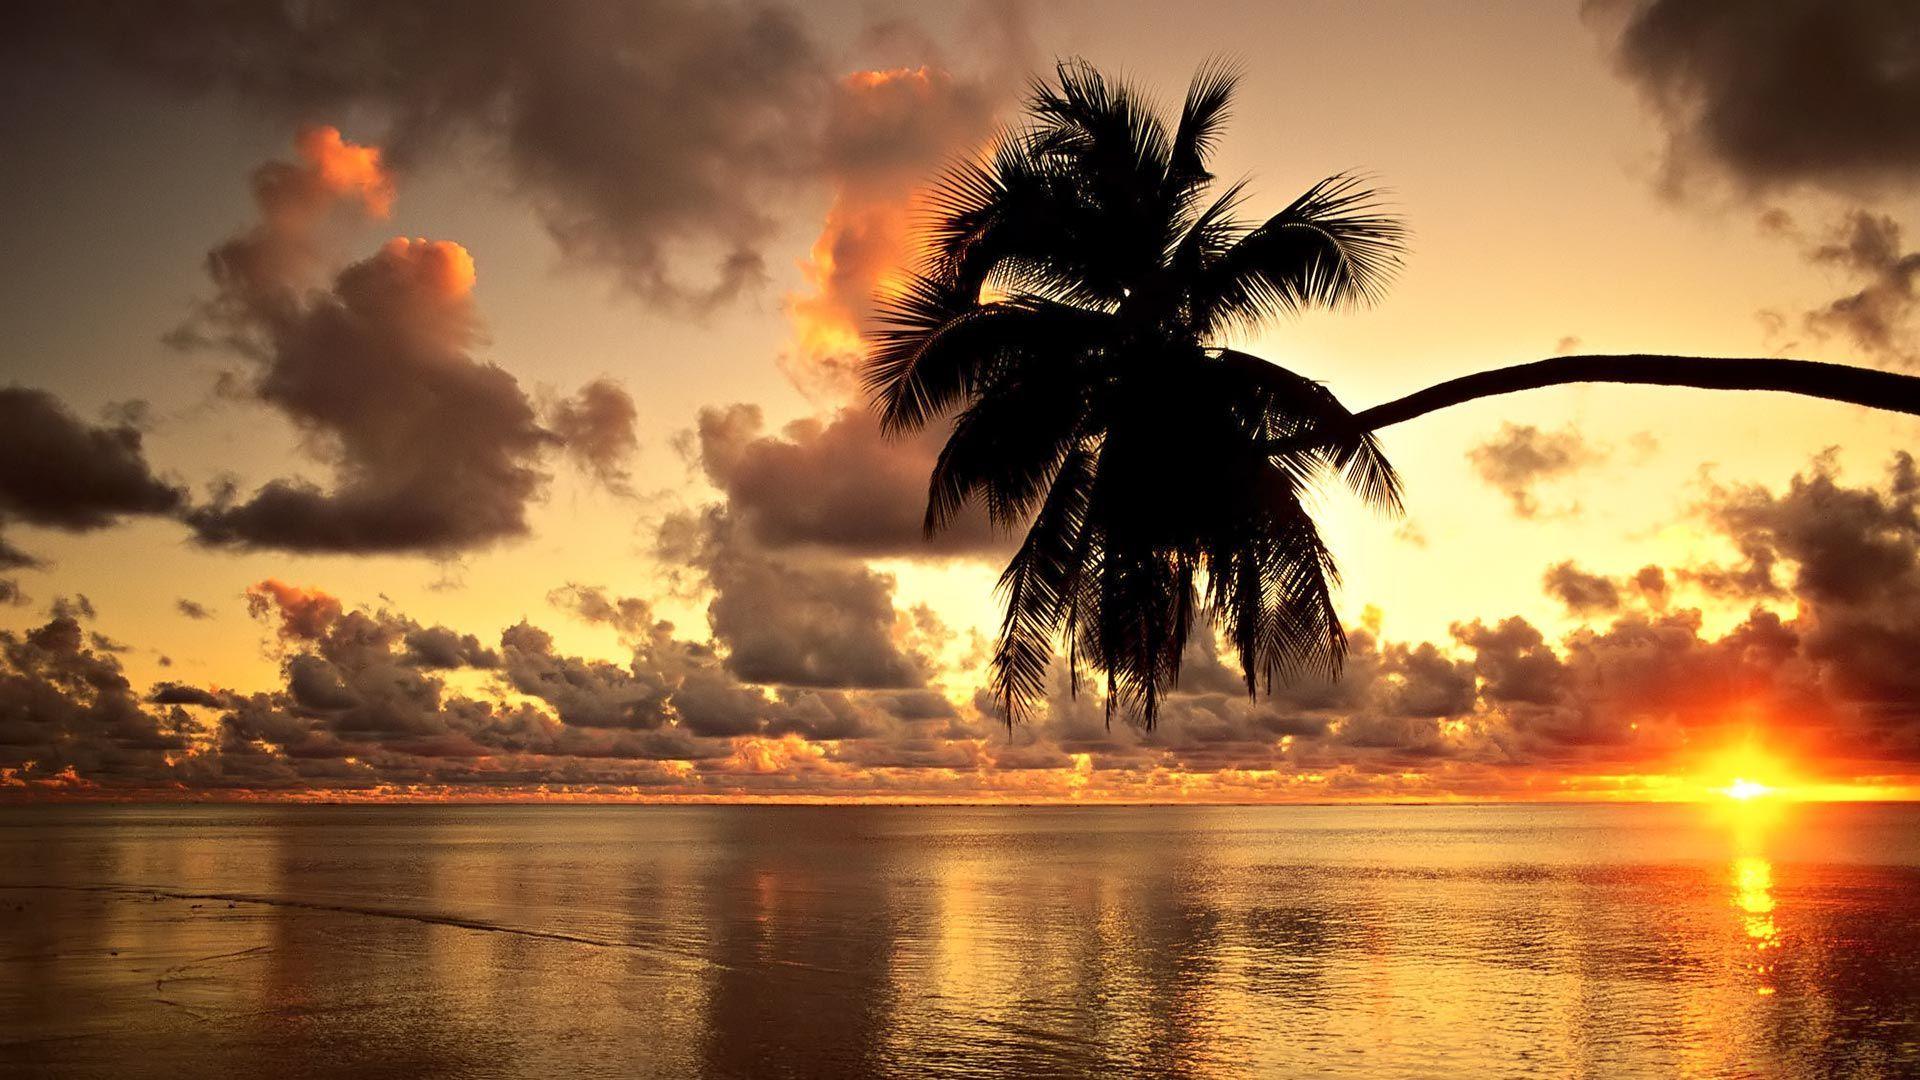 palm tree beach sunset sunset hd wallpapers palm trees sunset 1920x1080